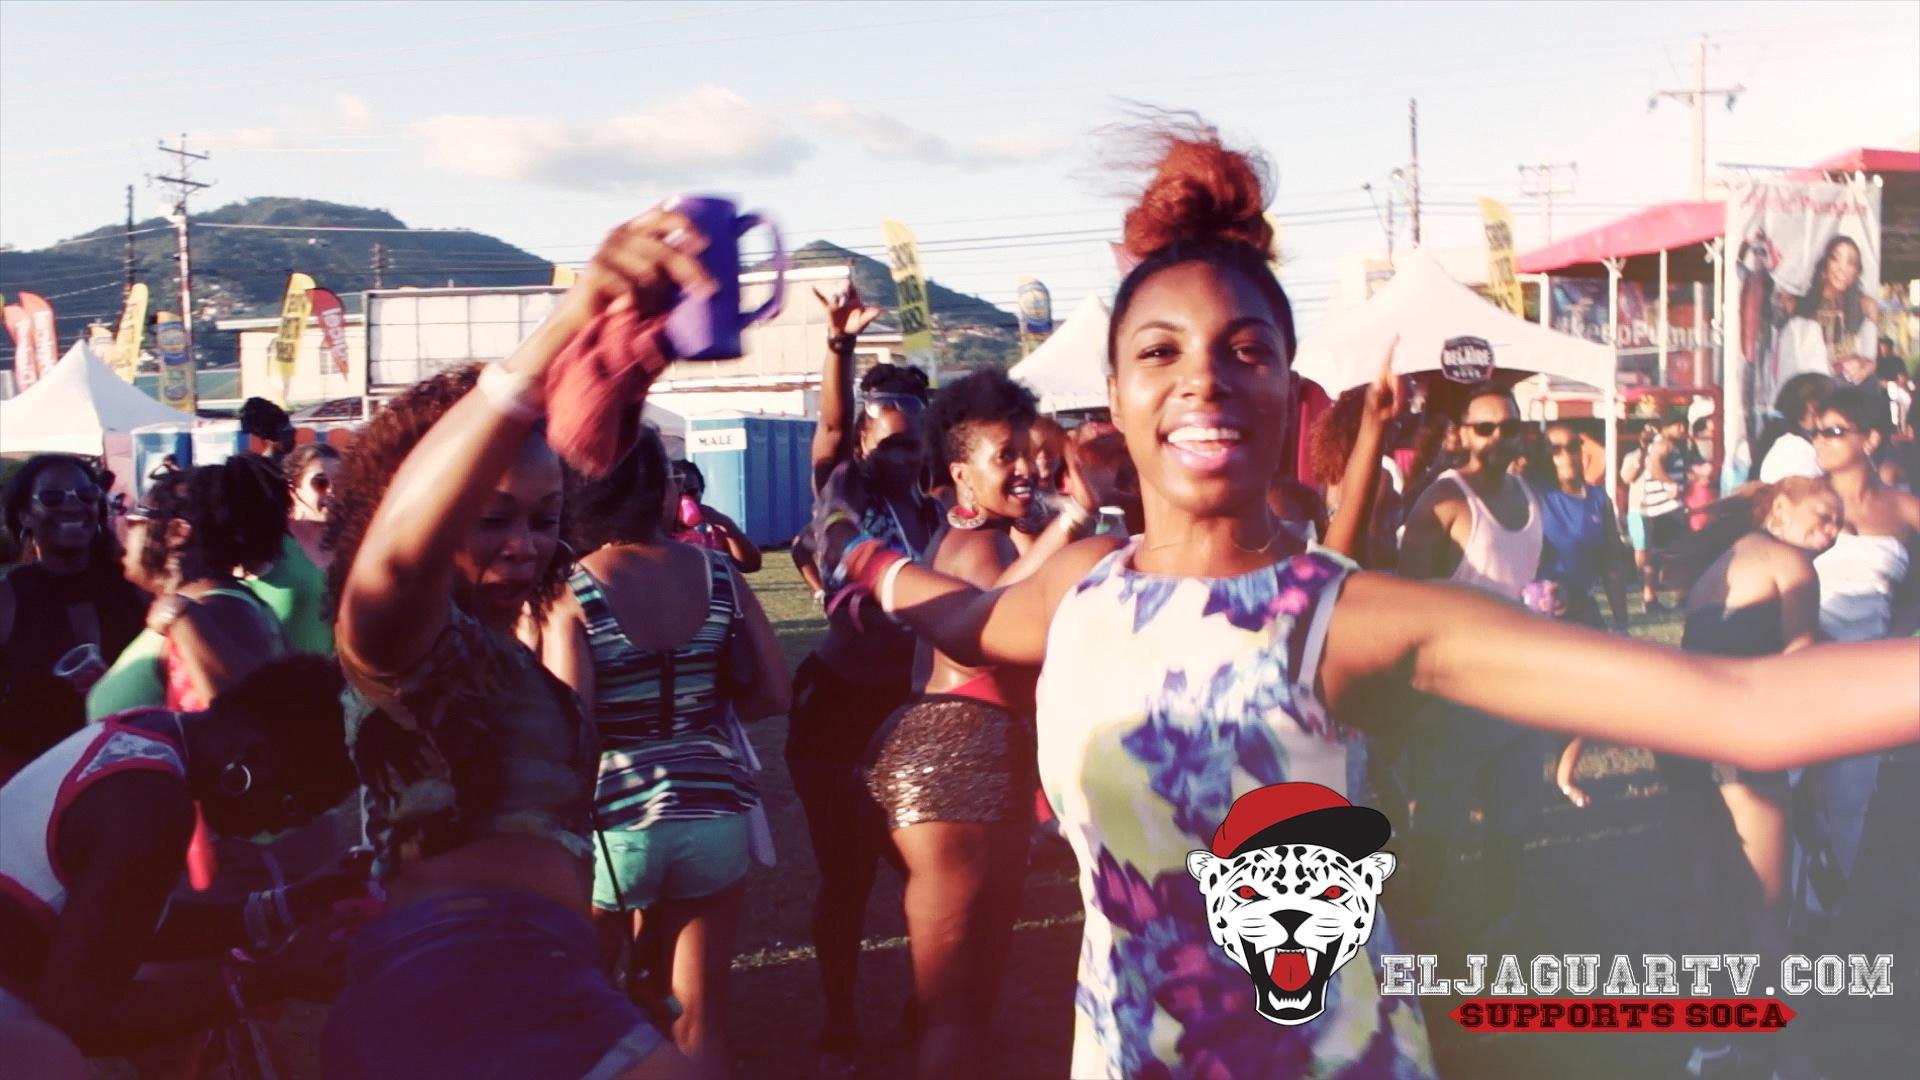 Trinidad Carnival 2015 ep 2 photo31.jpg